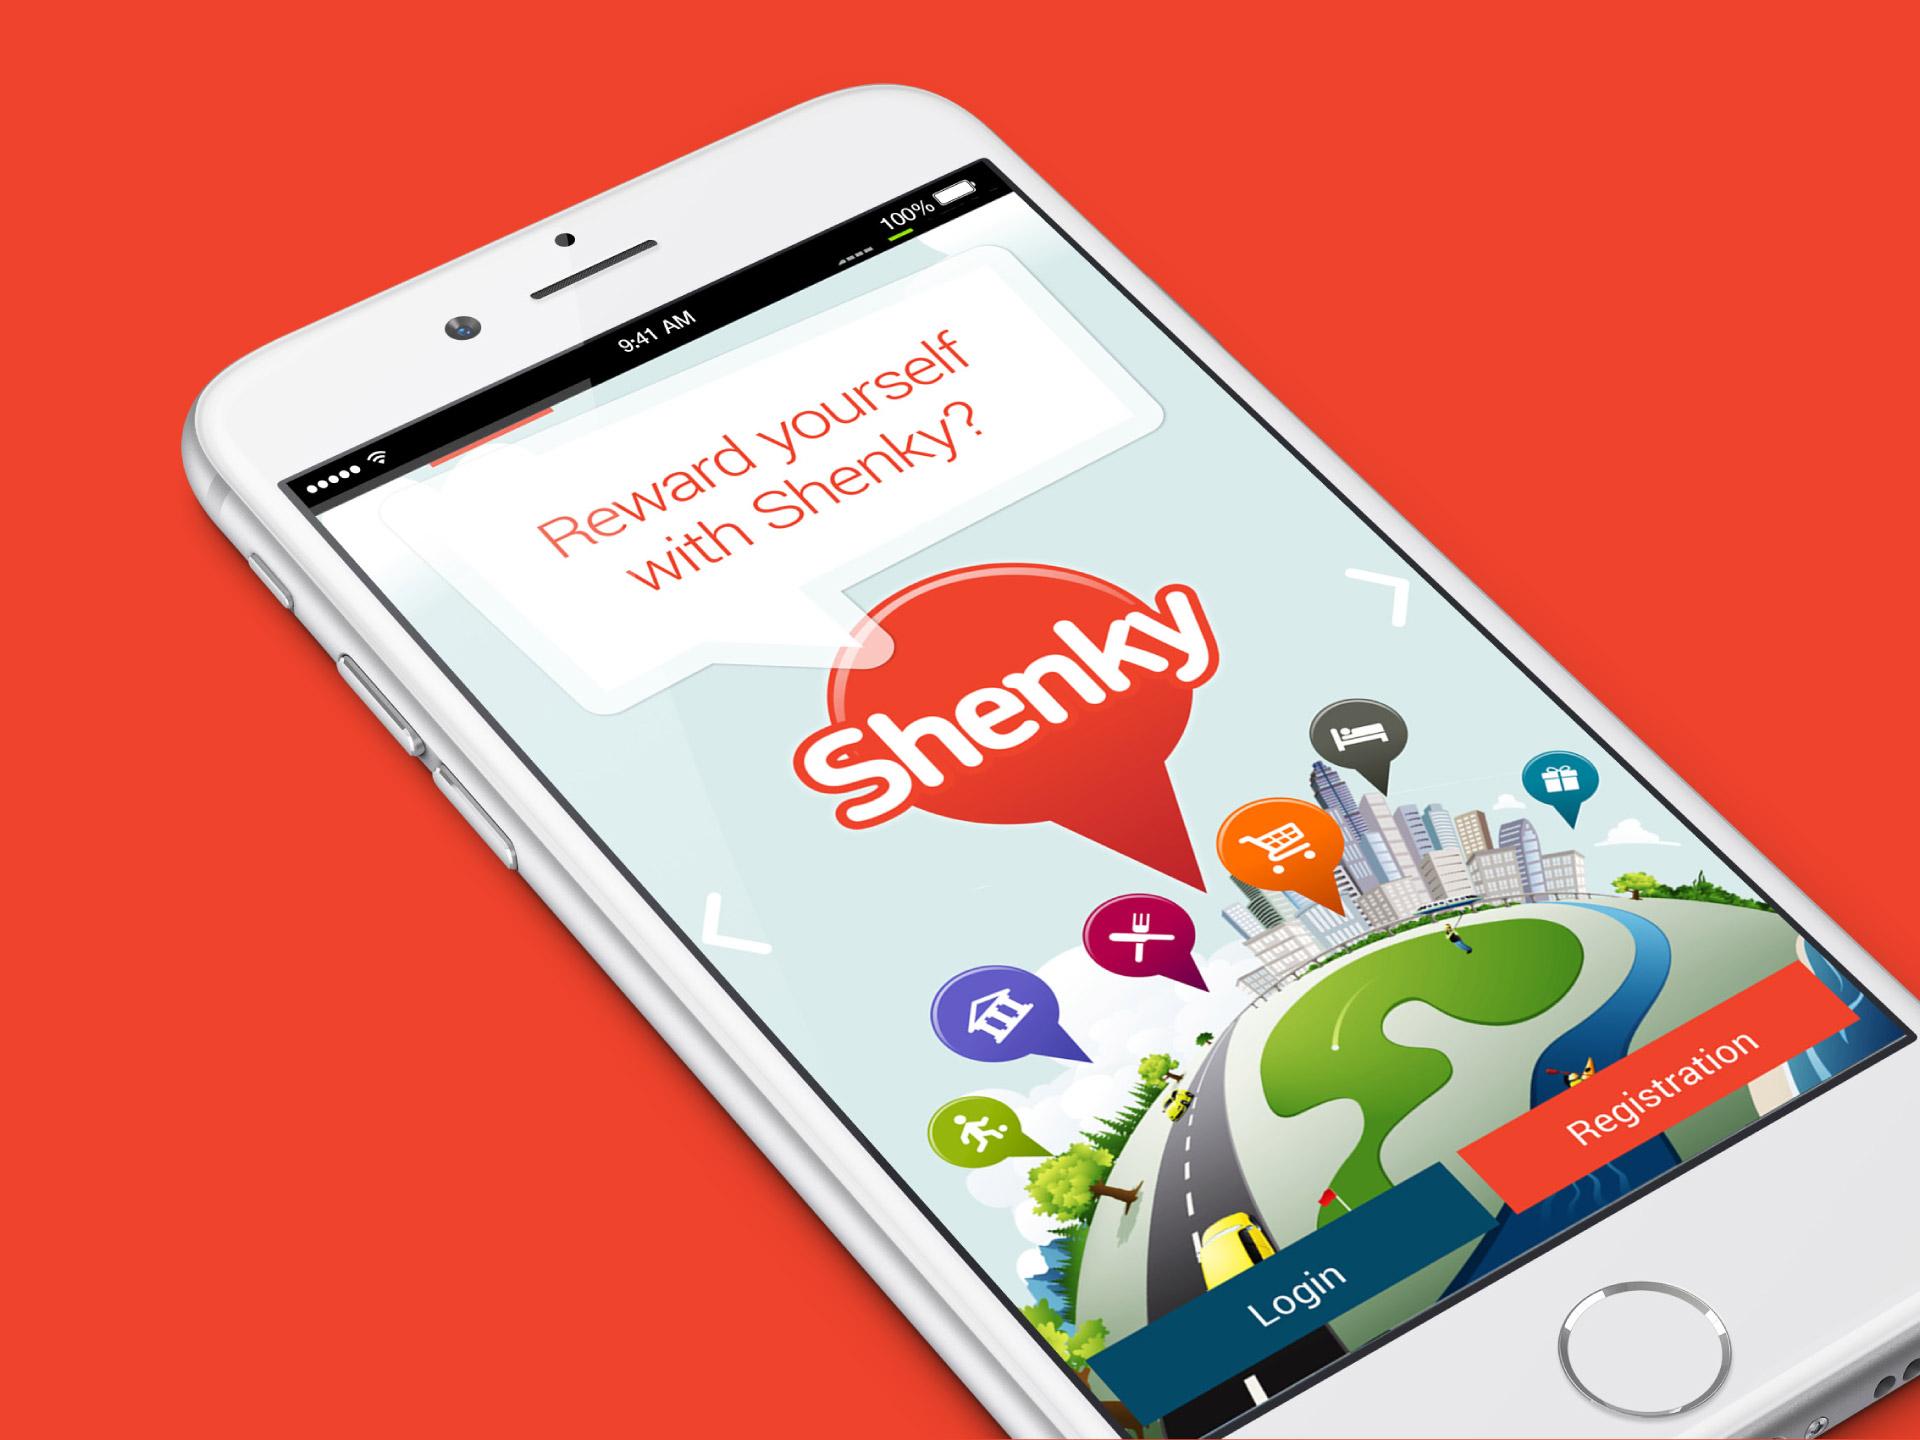 Shenky